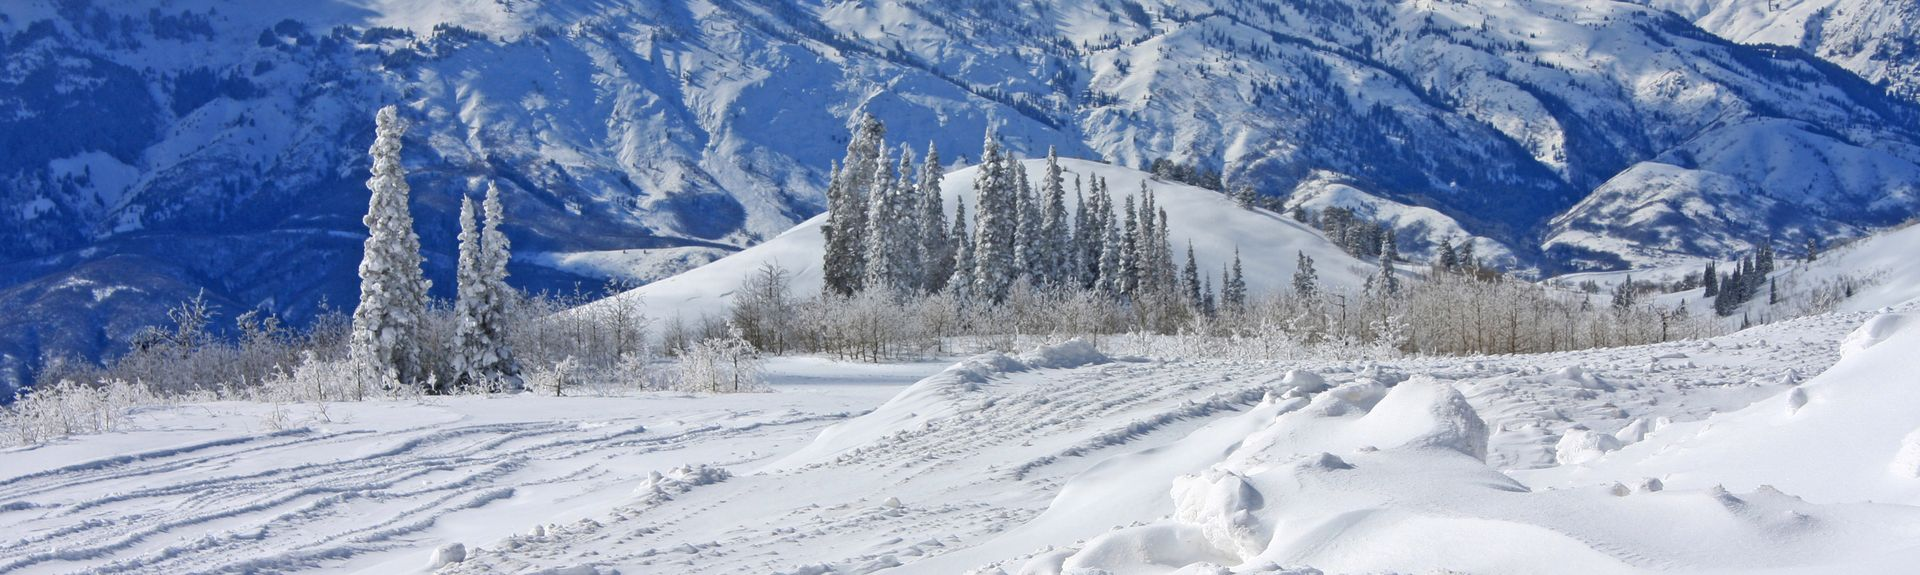 Powder Mountain, Cache County, UT, USA